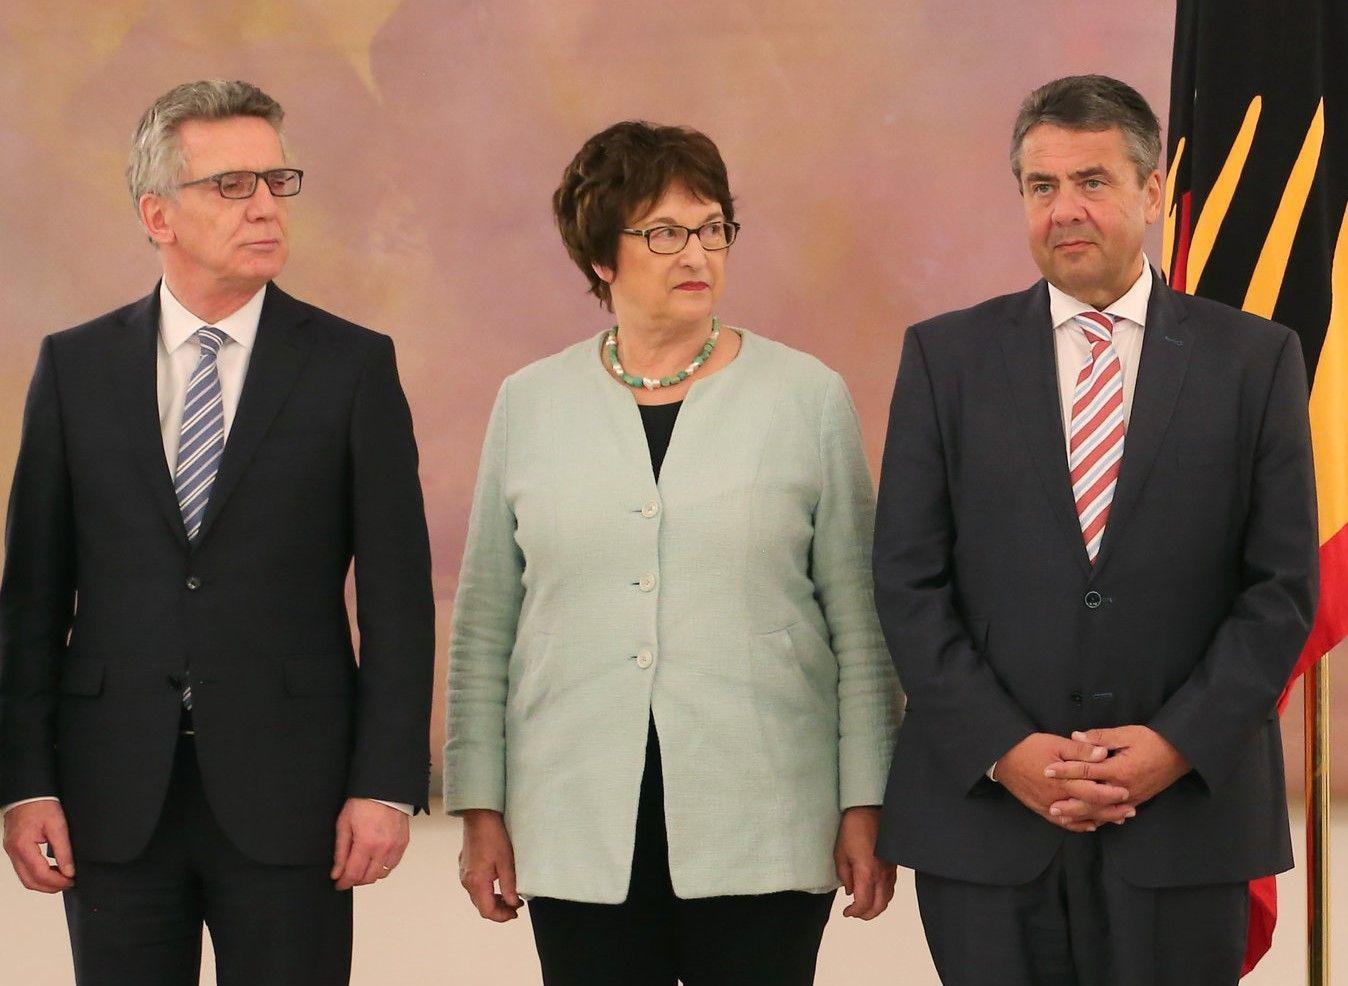 Thomas de Maiziere, Brigitte Zypries, Sigmar Gabriel